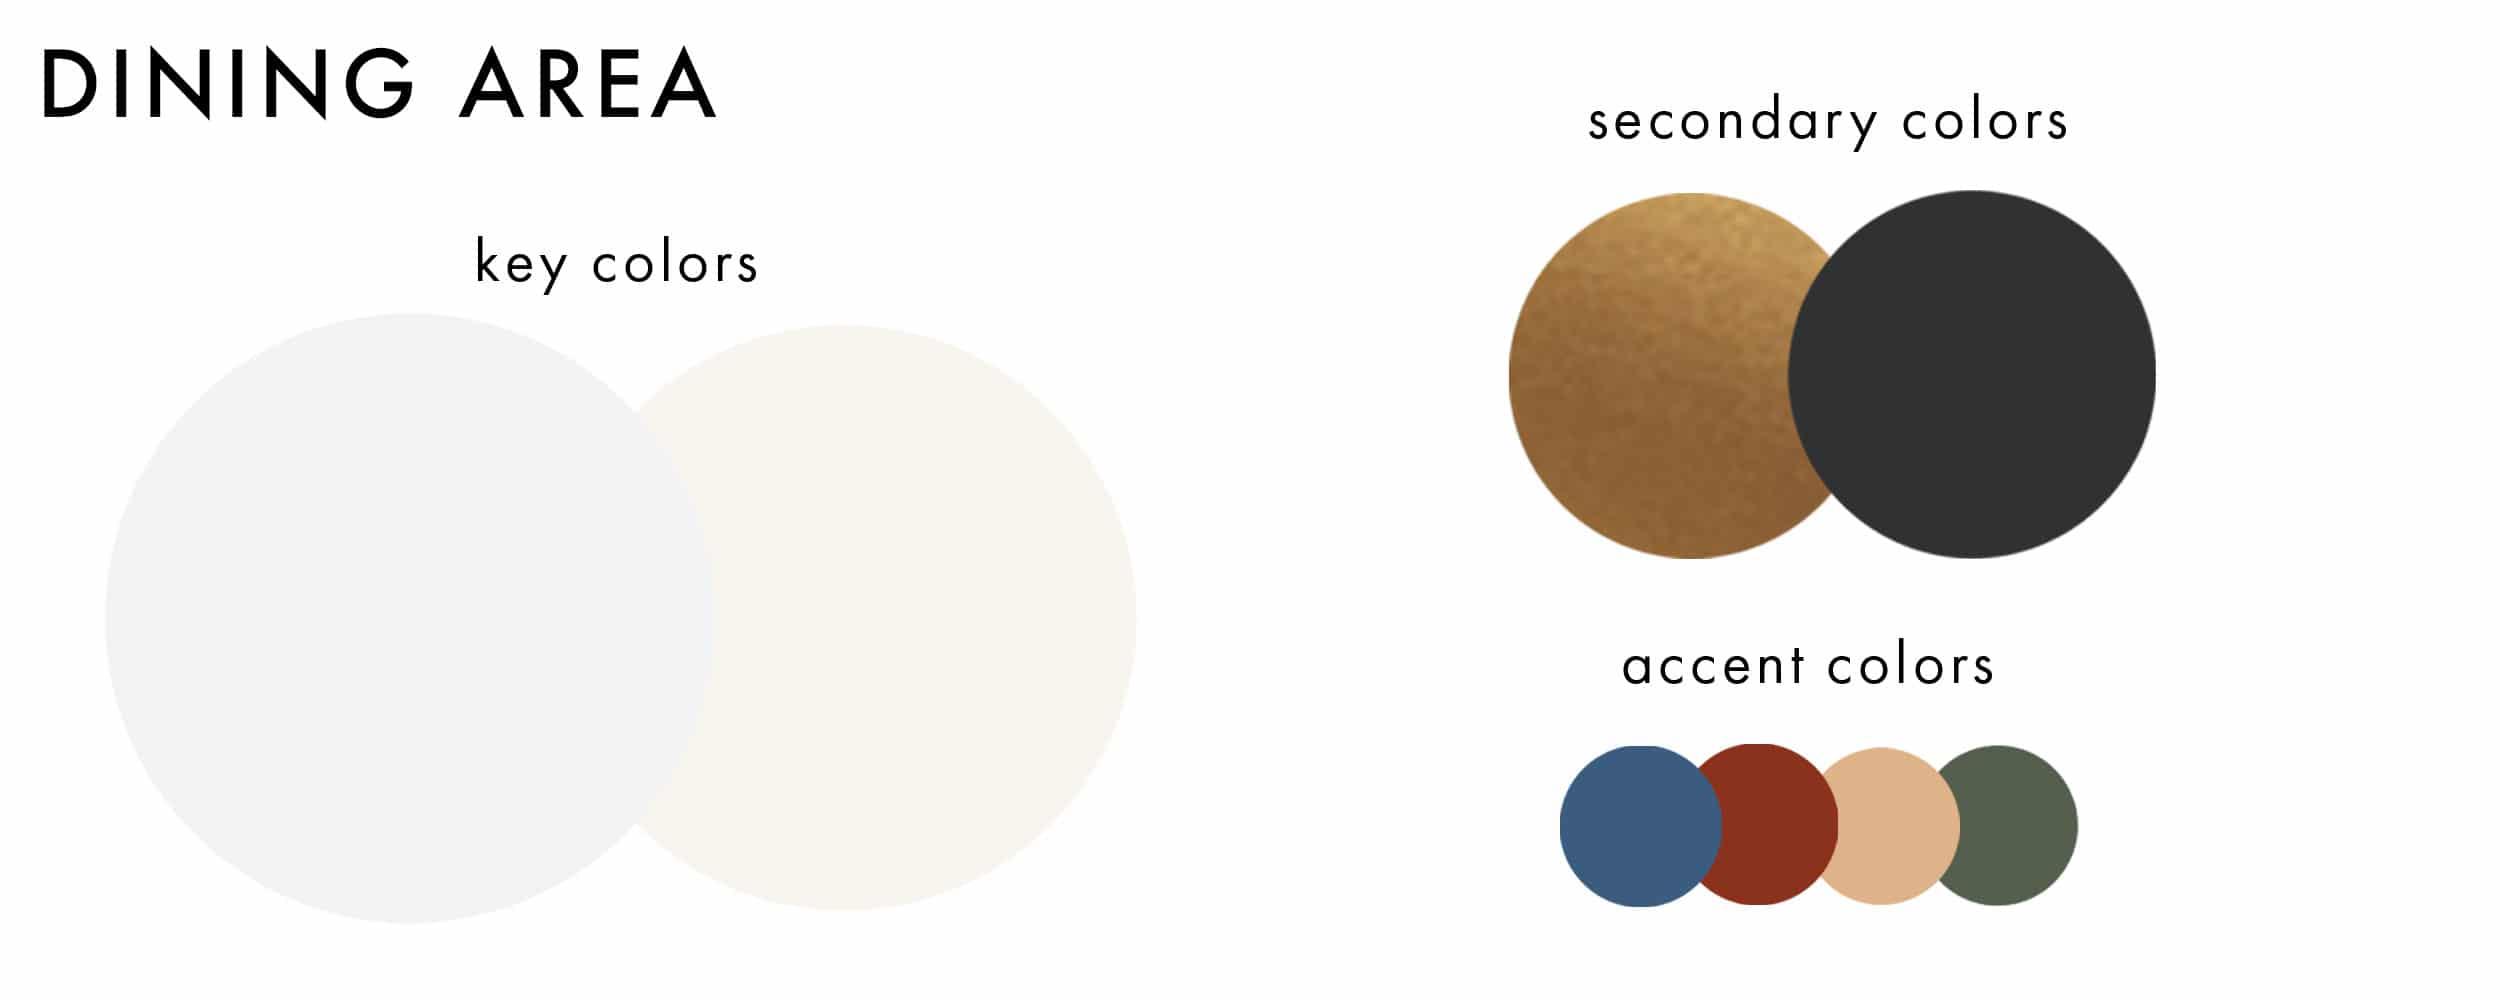 Dining Area Color Pallete